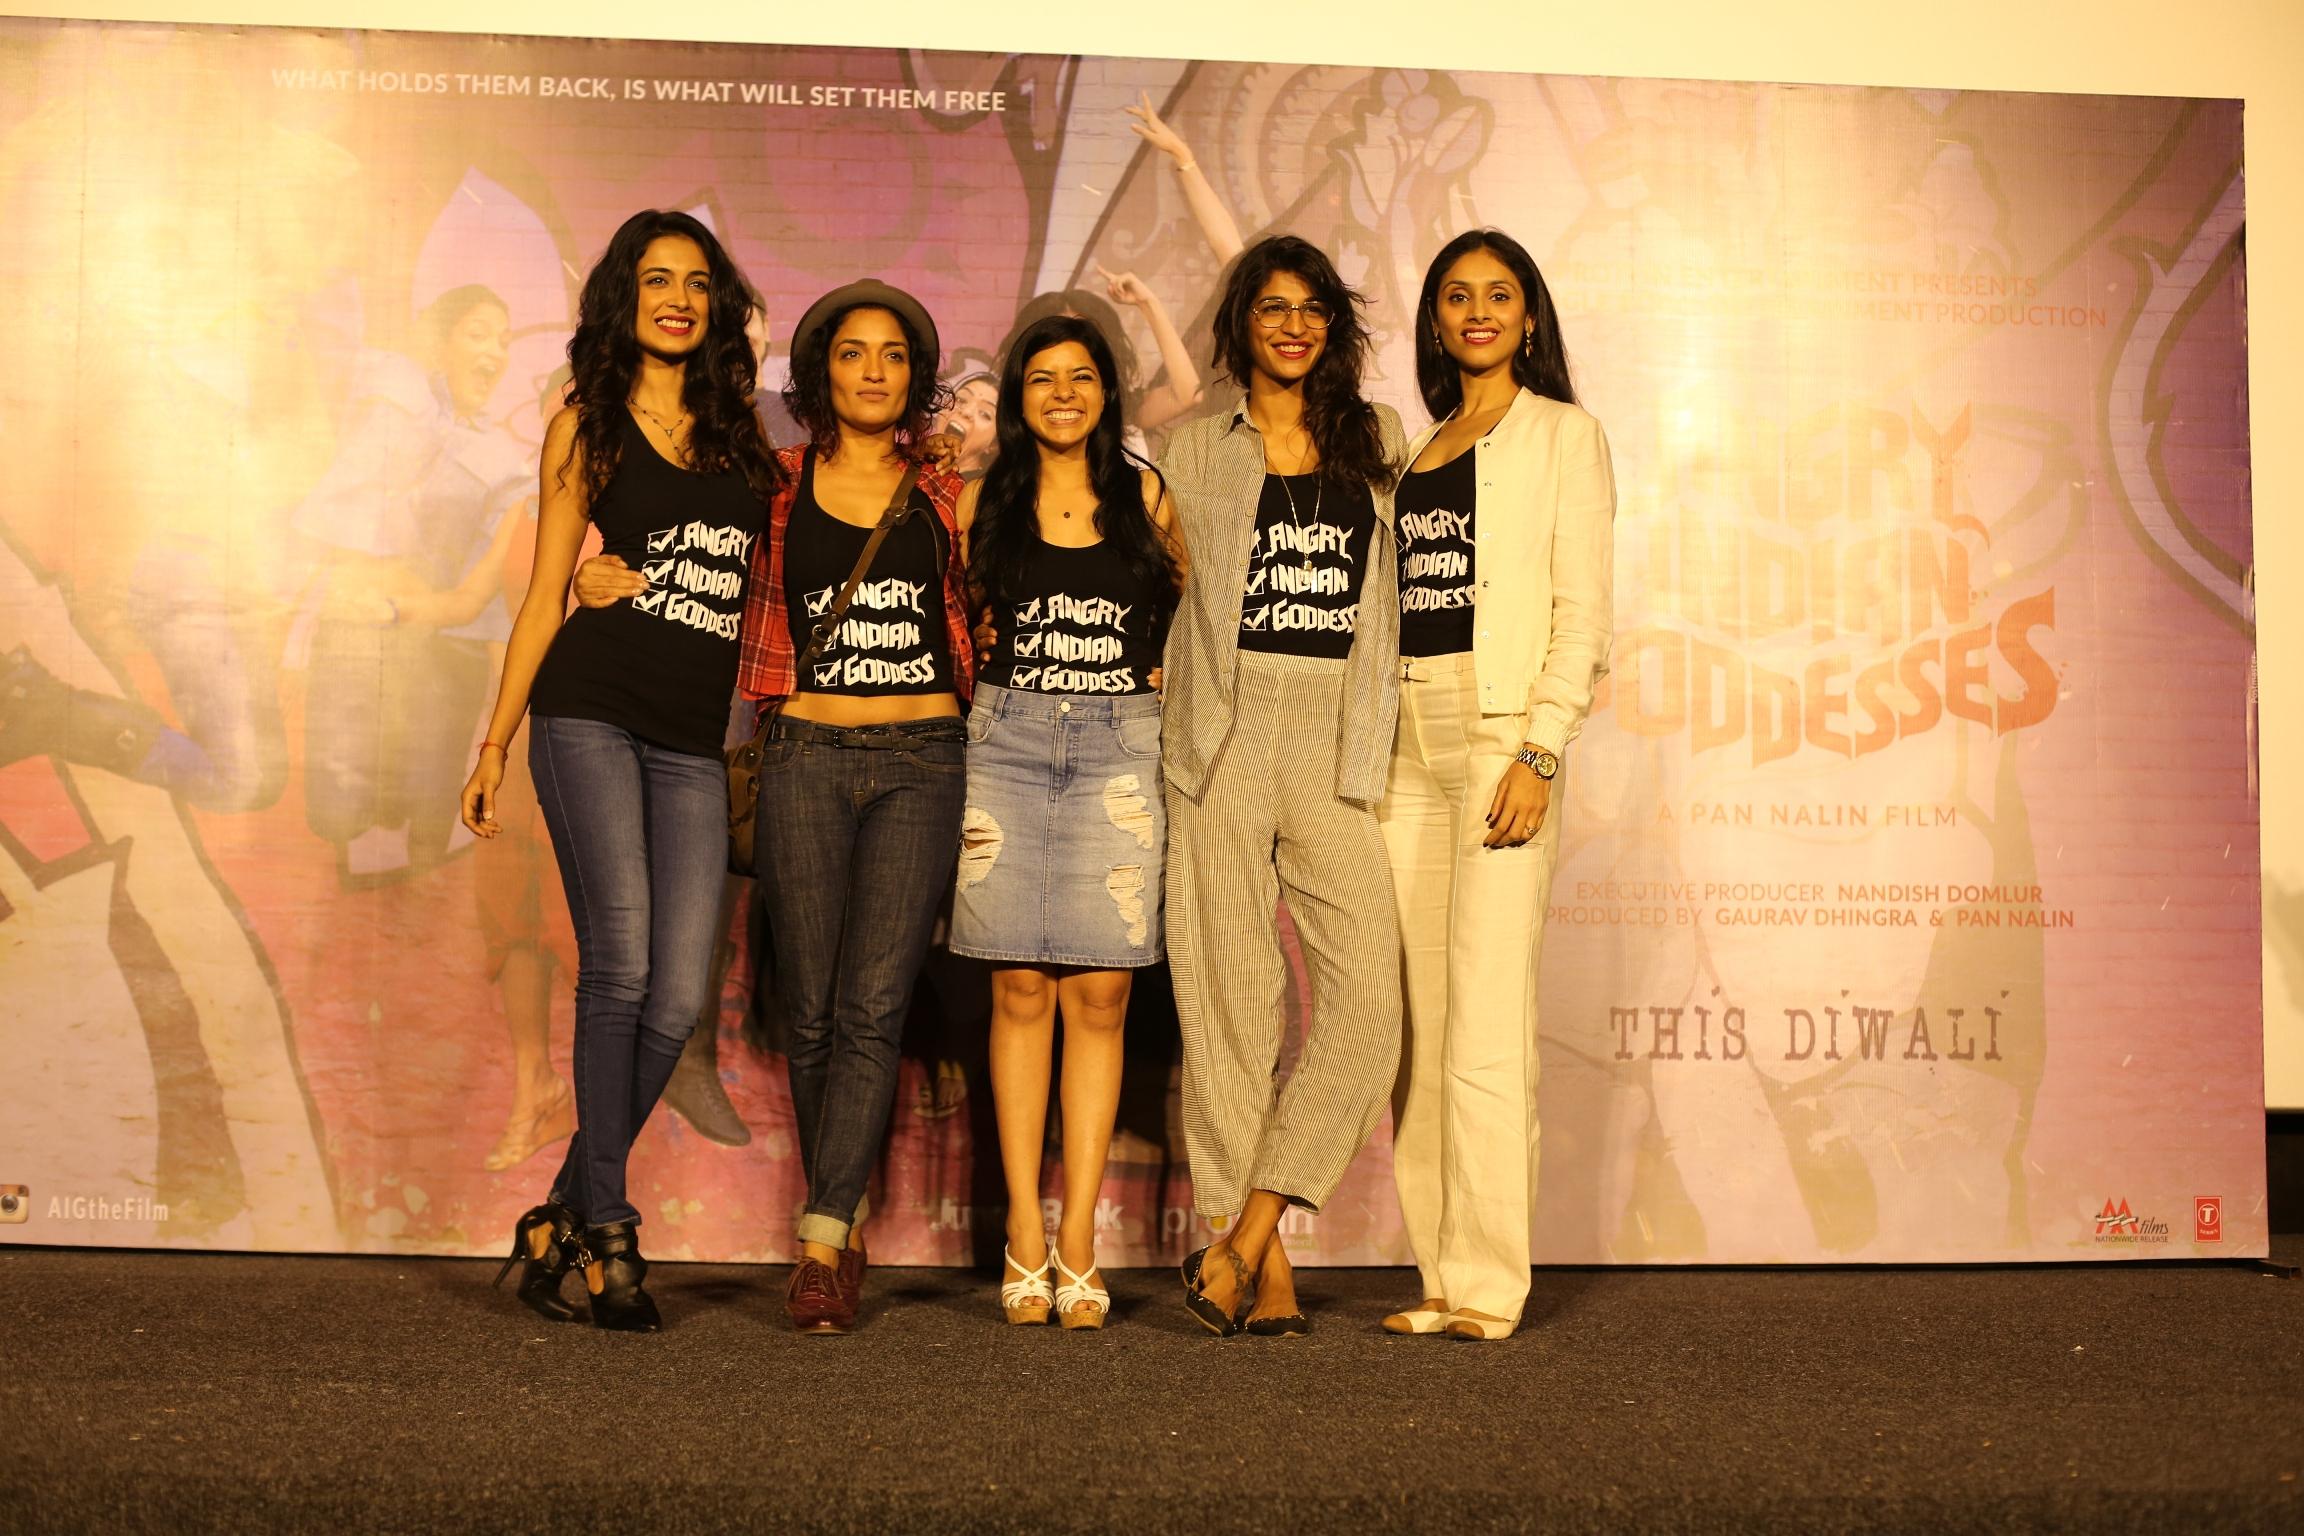 Trailer Launch Event of Angry Indian Goddesses with star cast (l-r )Sarah Jane Dias , Sandhya Mridul, Rajshri Deshpande. Anushka Manchanda & Pavleen Gujral